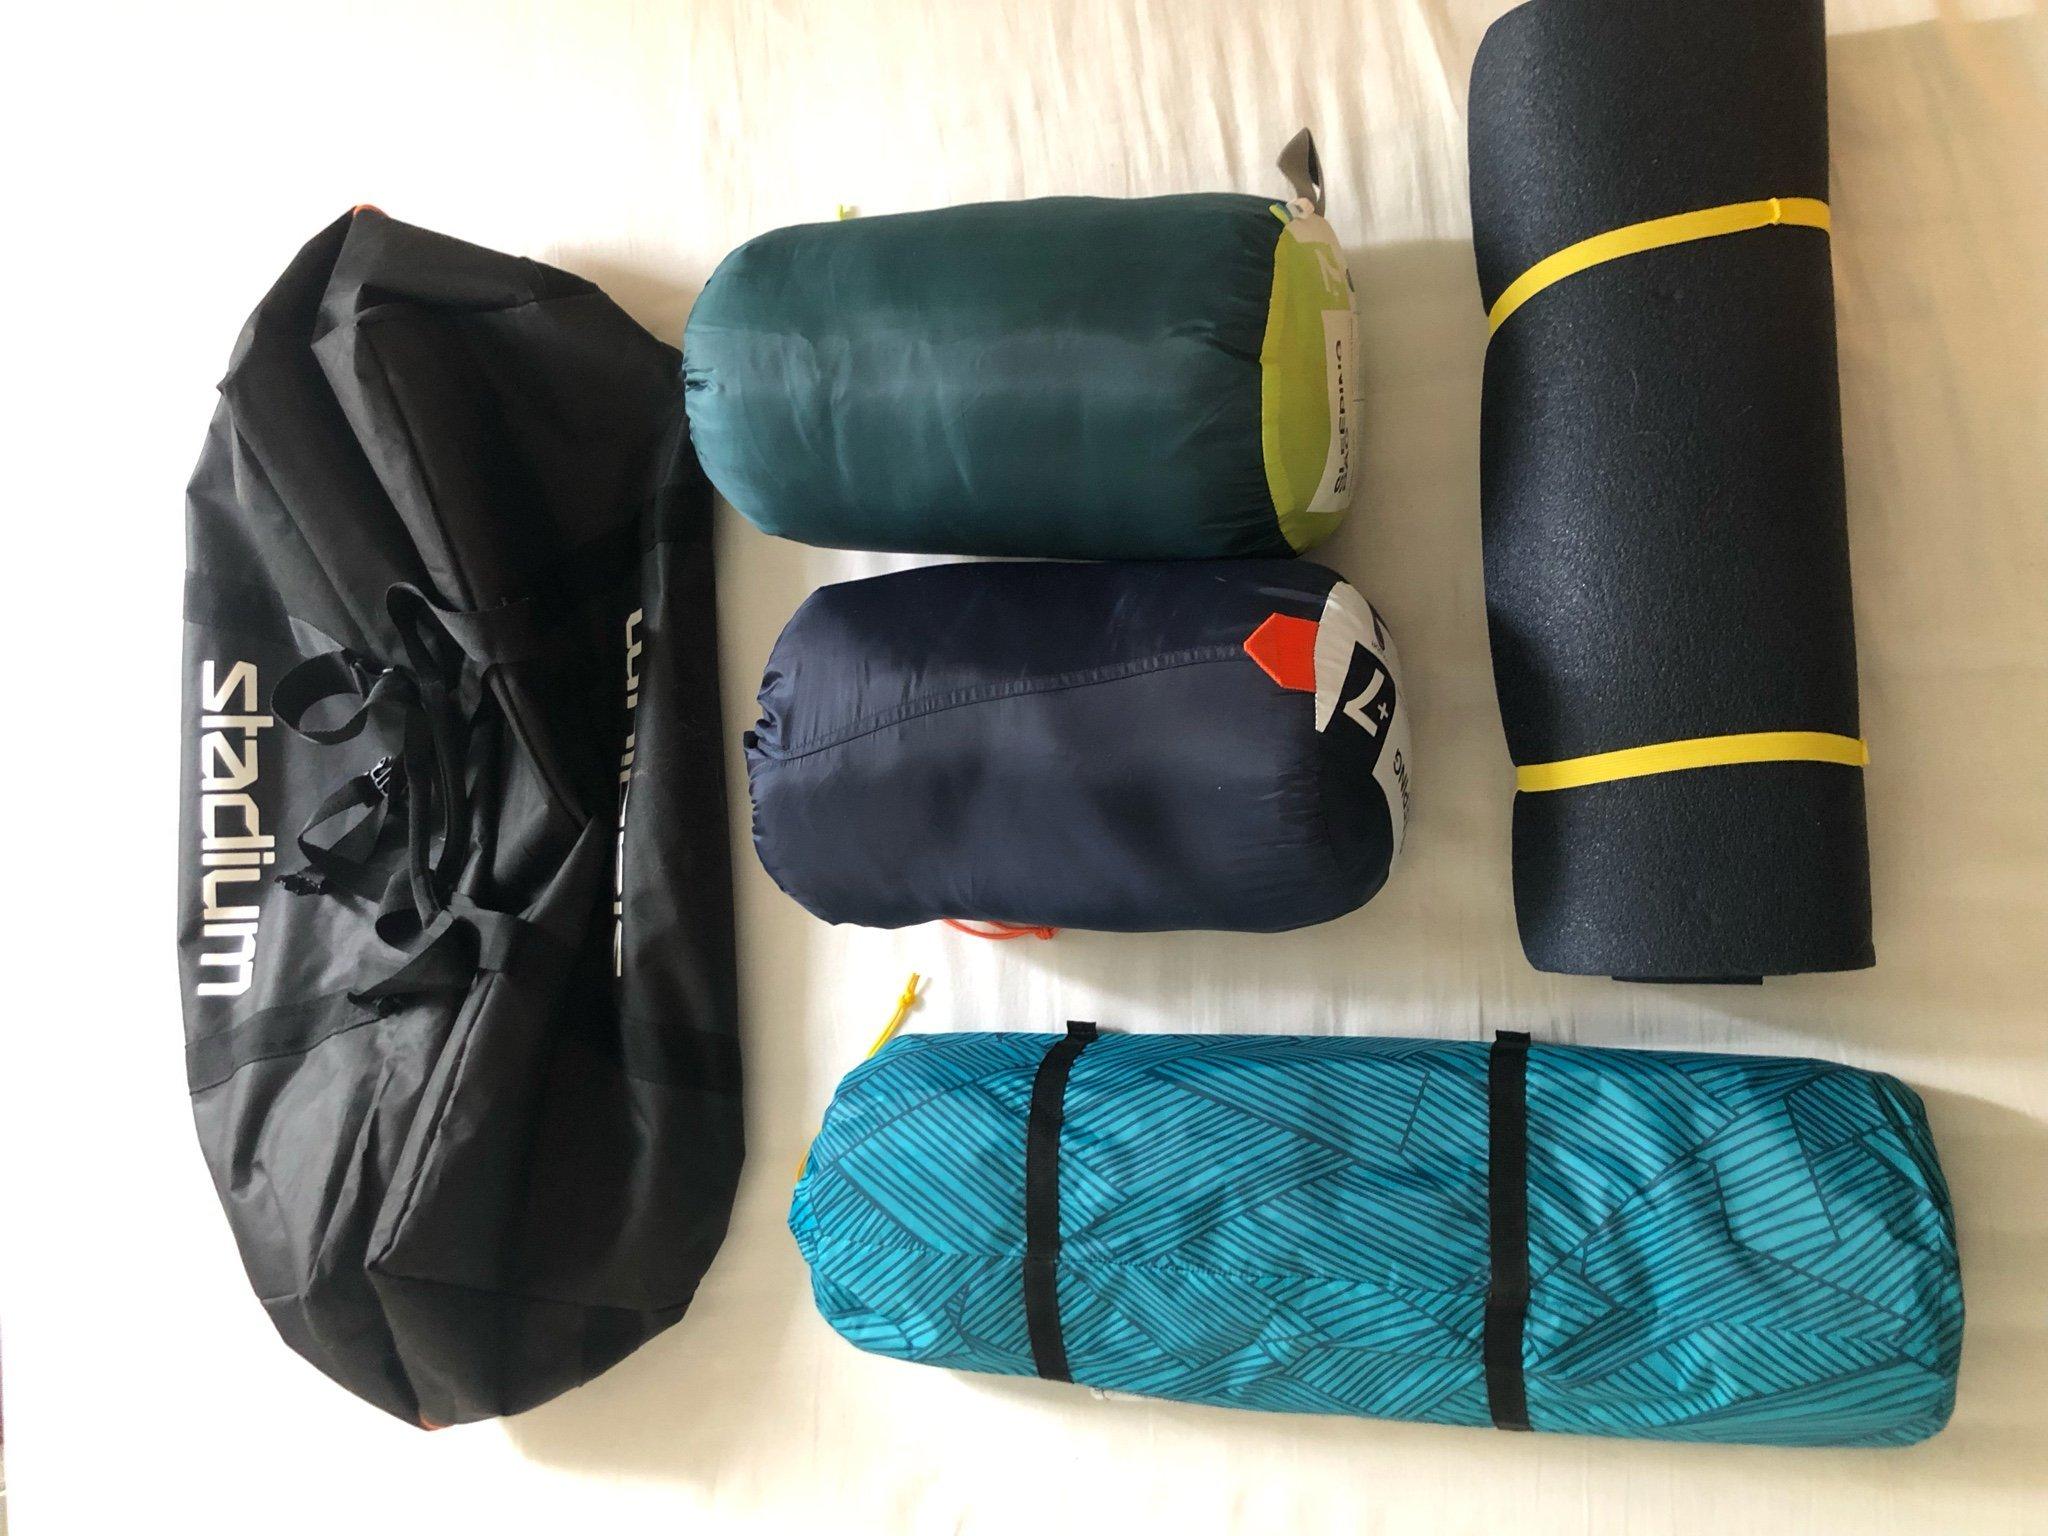 2P Tent + 2 sleeping bags + stadium bag 65L (359959085) ᐈ